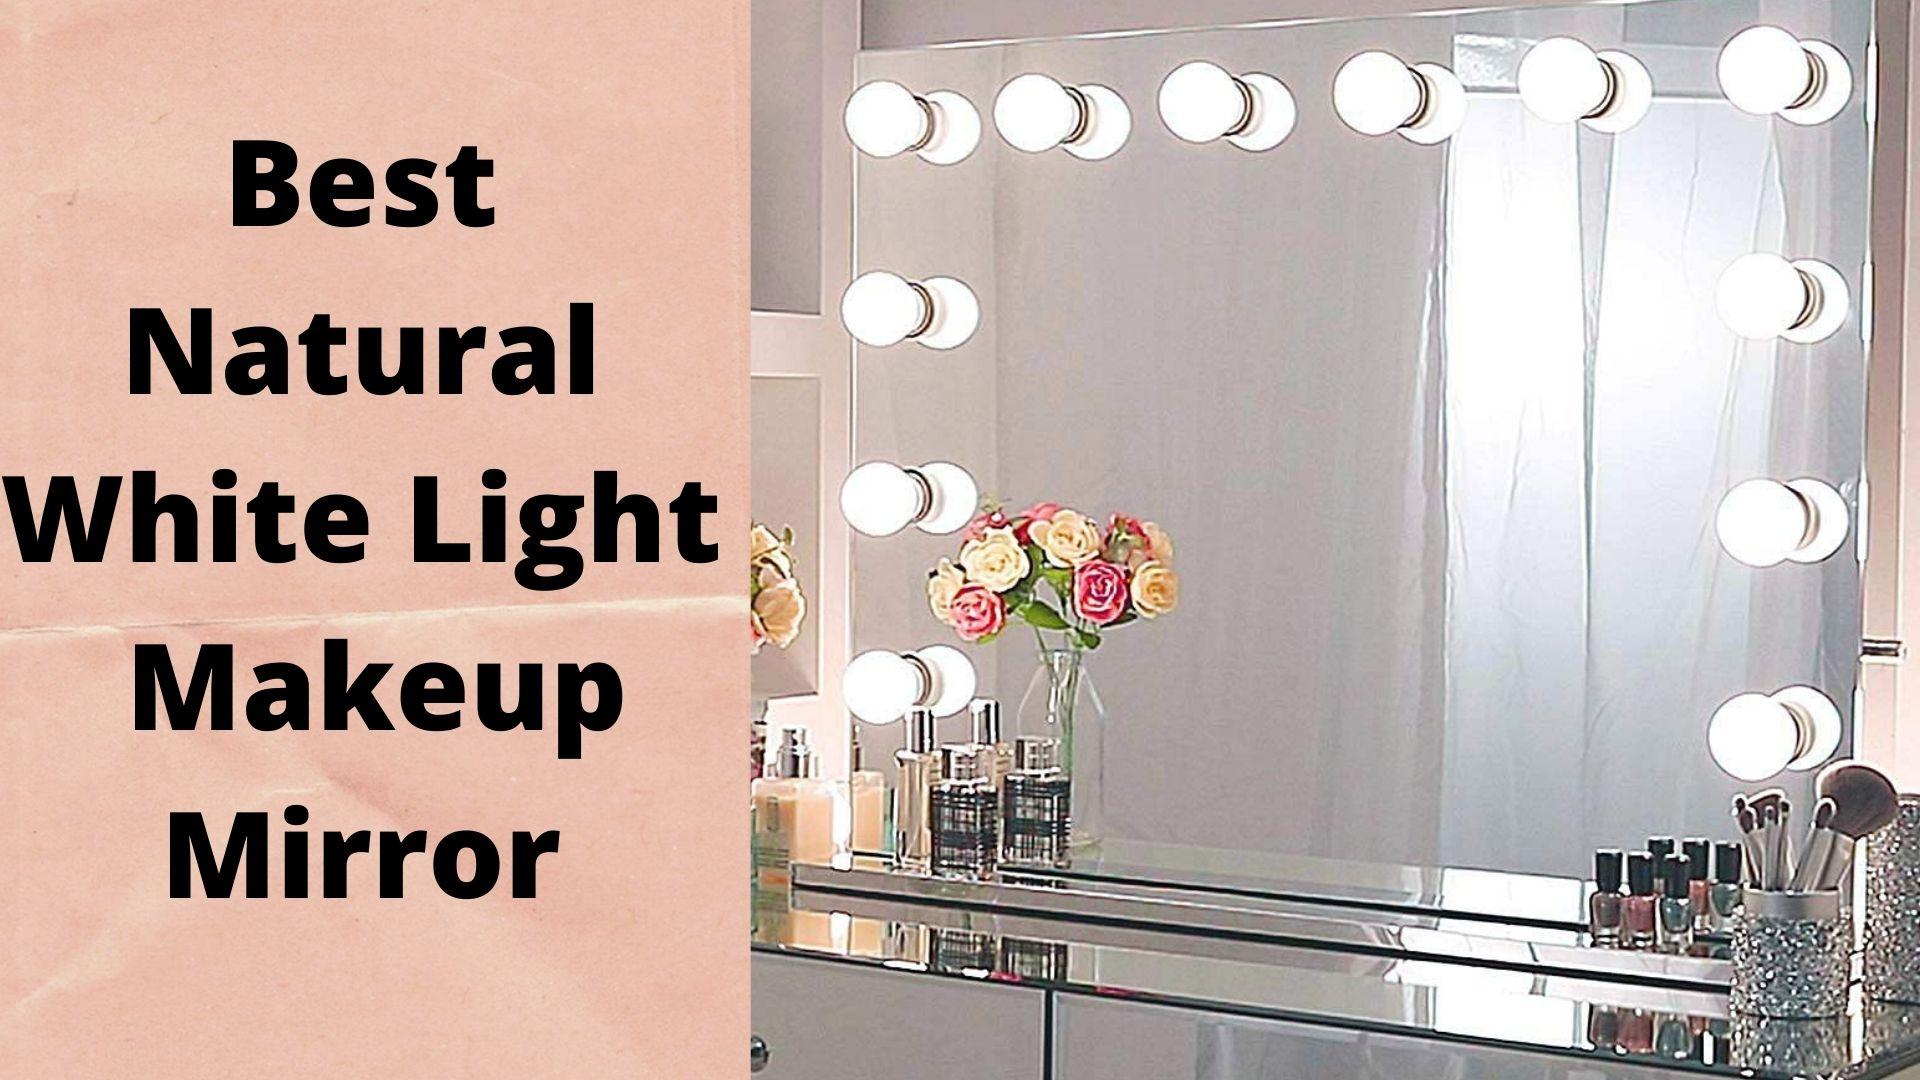 Best Natural White Light Makeup Mirror